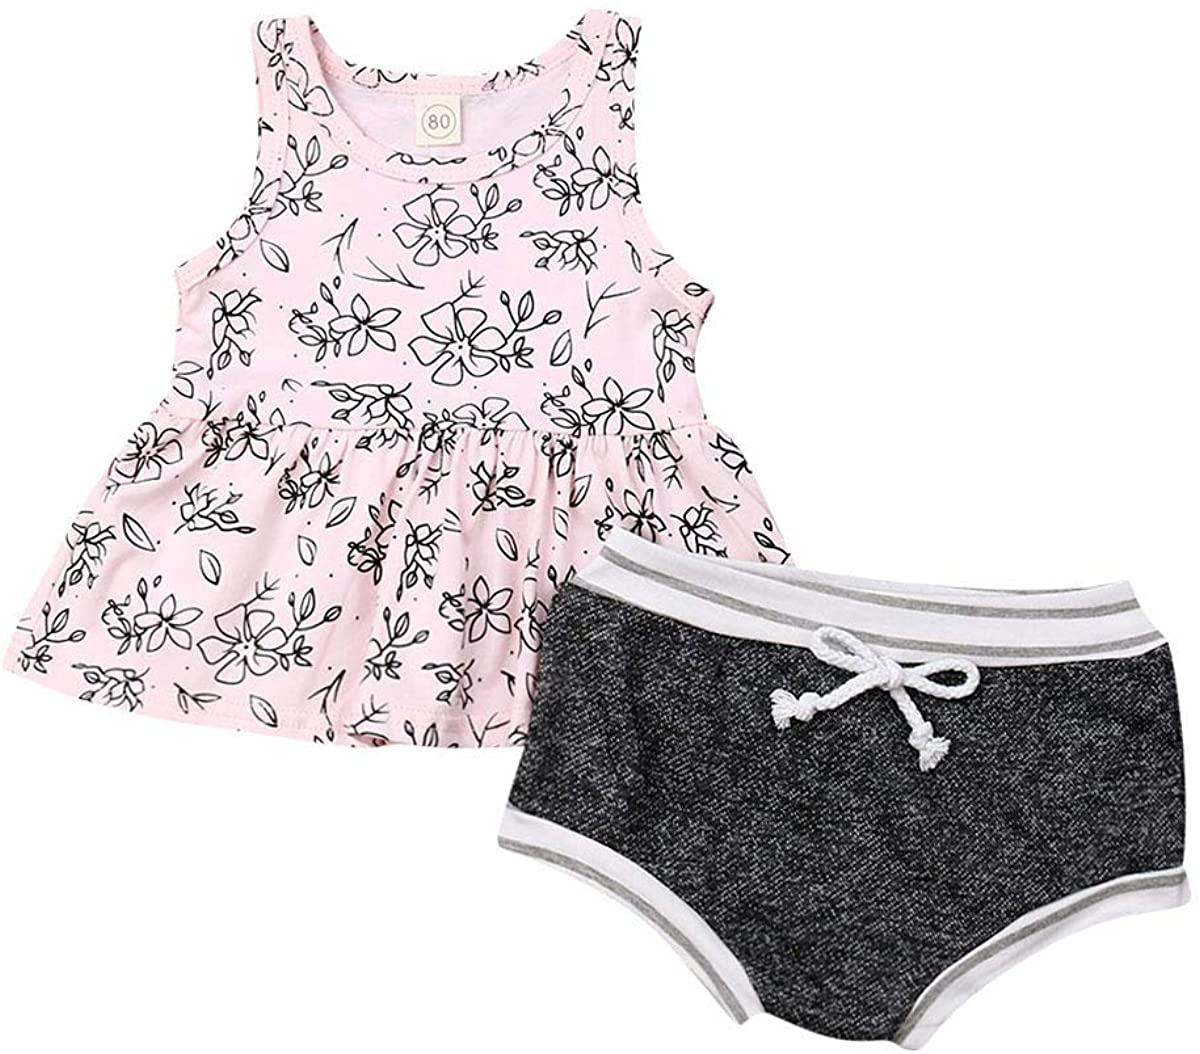 Toddler Kid Baby Girl Floral Sleeveless Top Dress T-Shirt Shorts Bottoms 2Pcs Summer Outfits